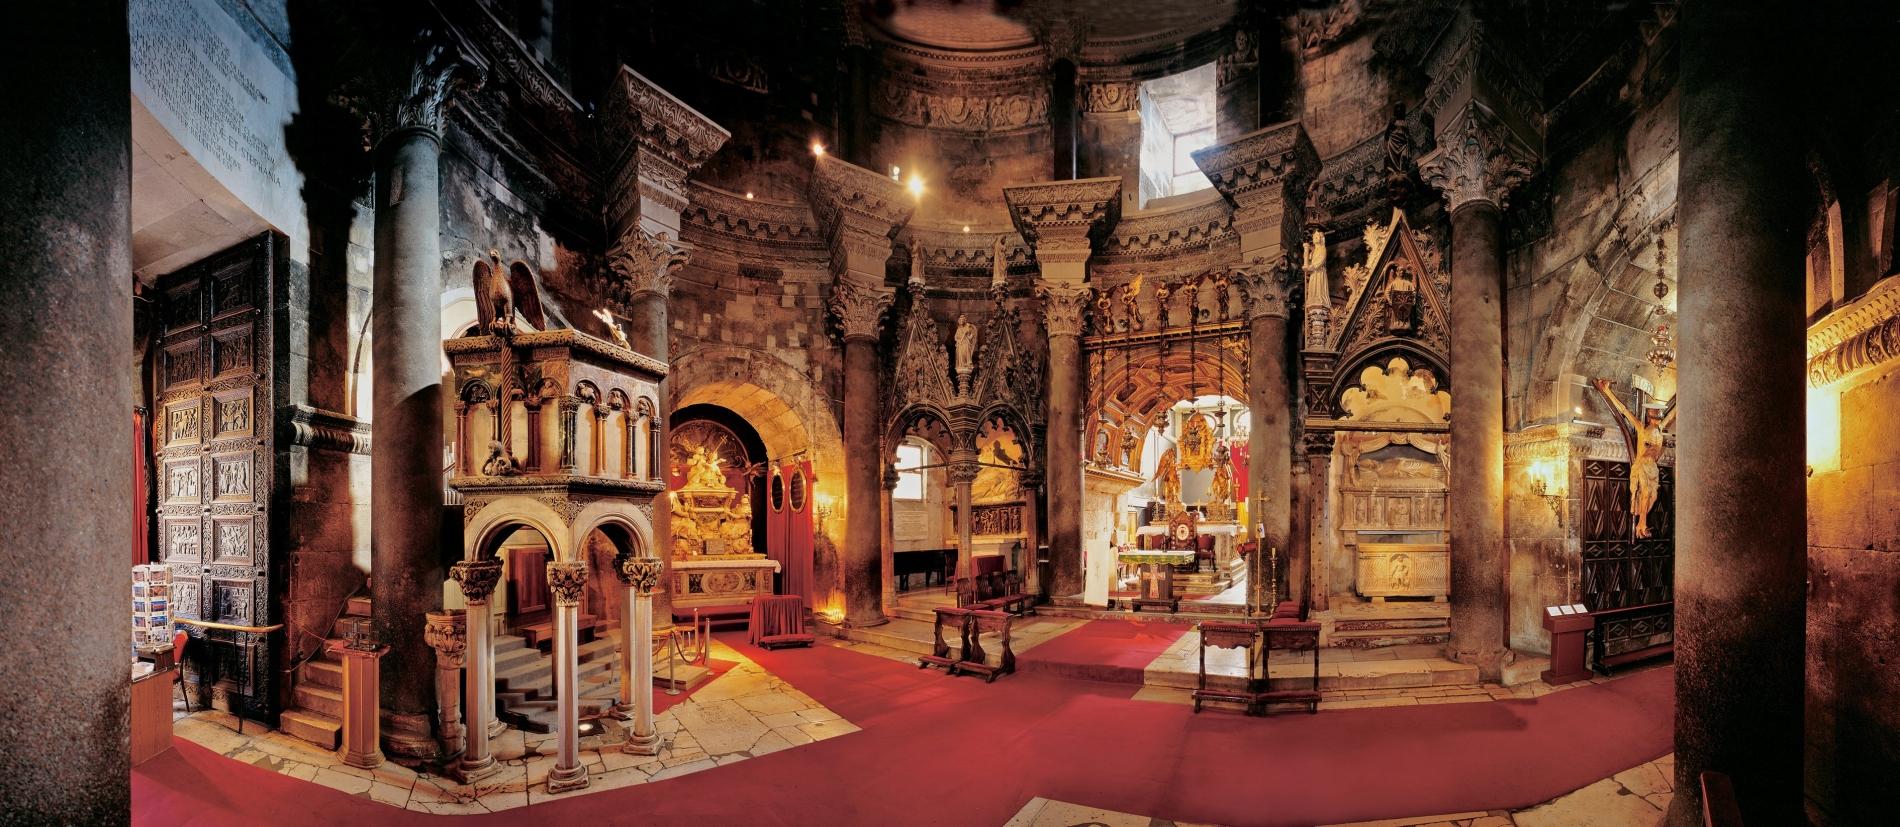 saint duje church